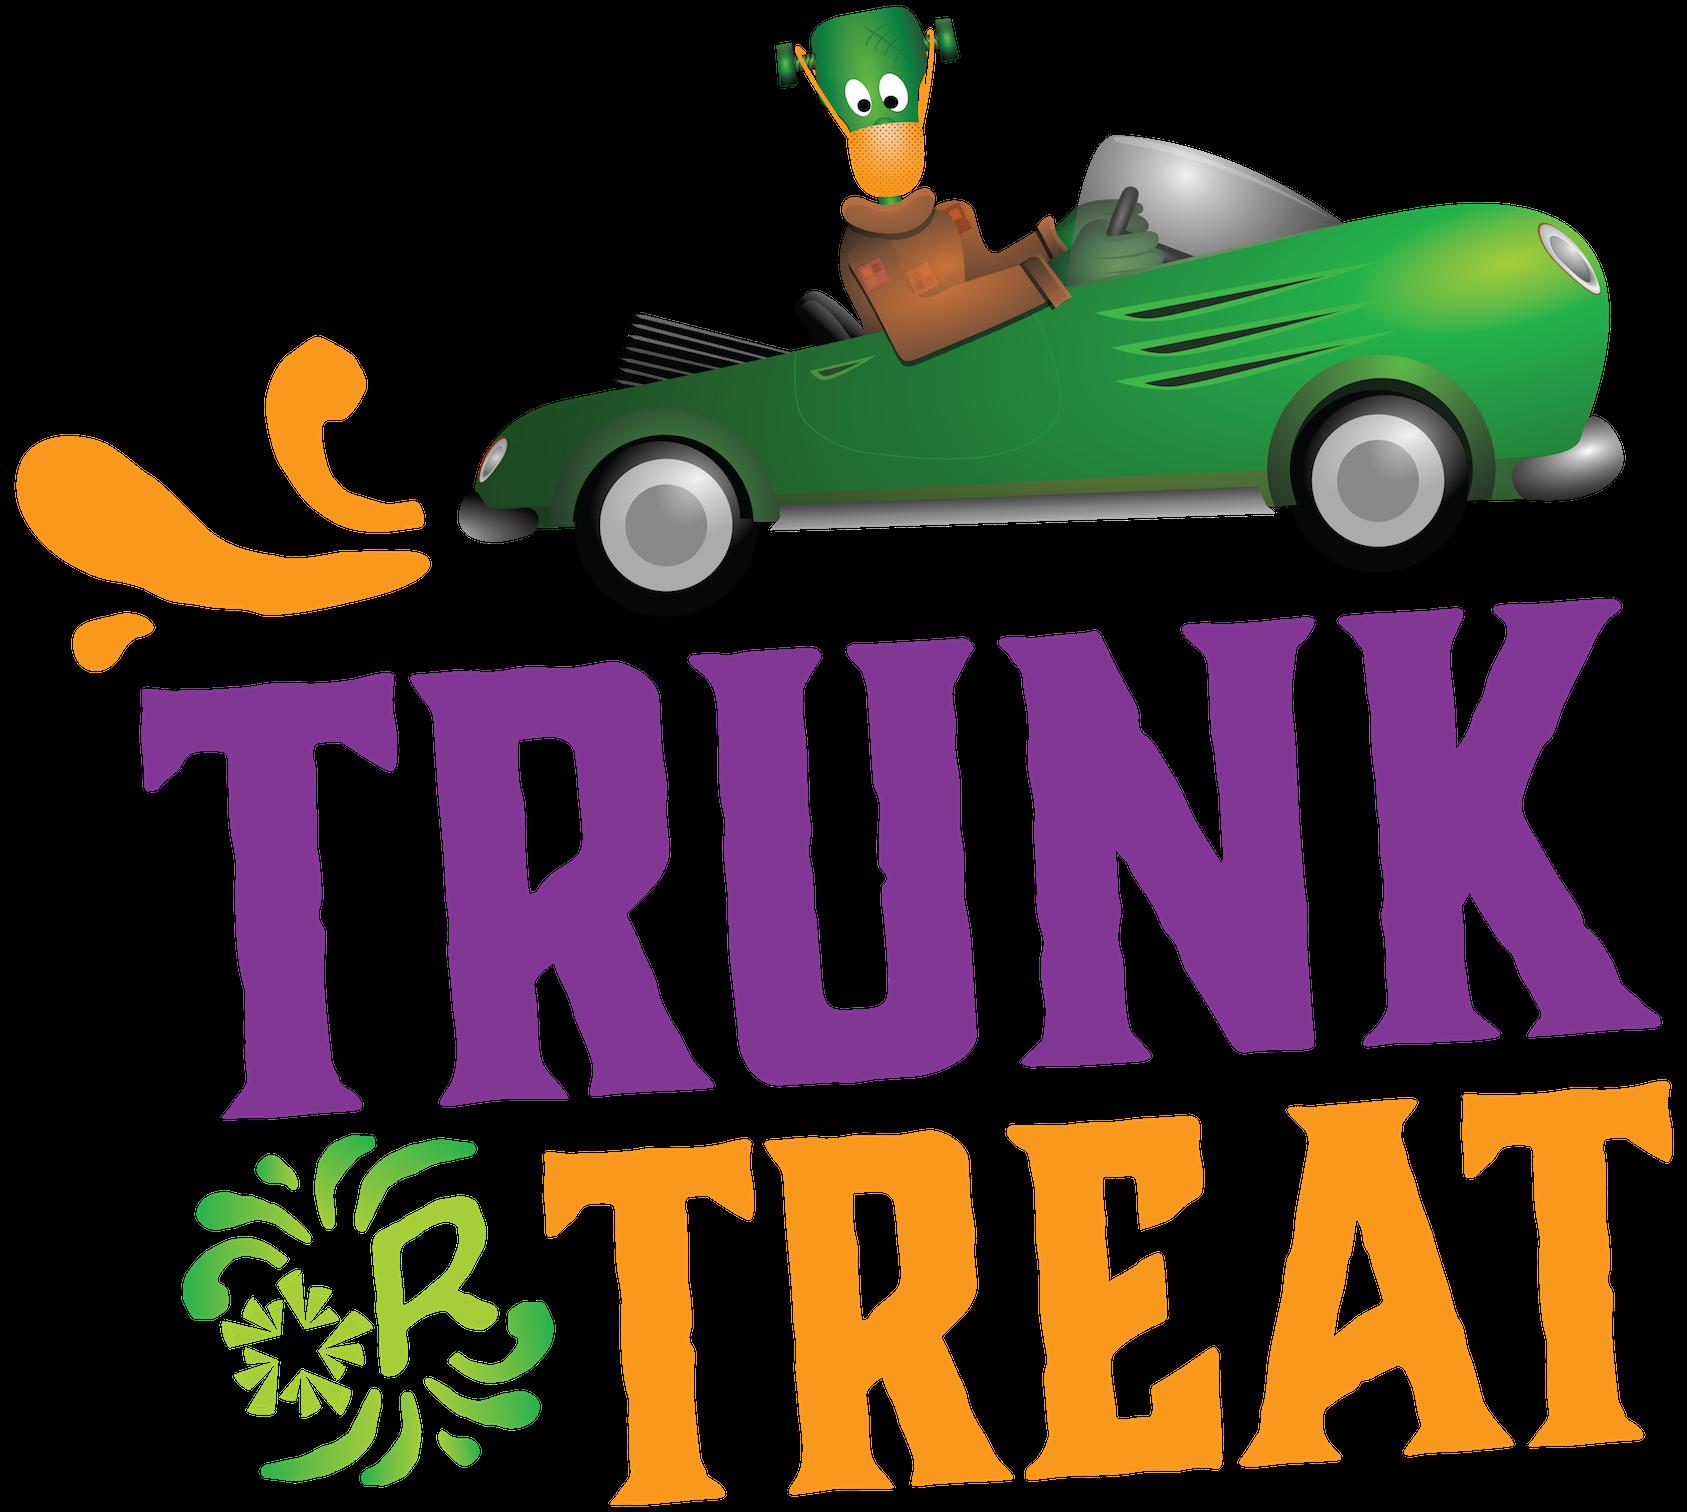 NTPA Trunk or Treat logo 2020